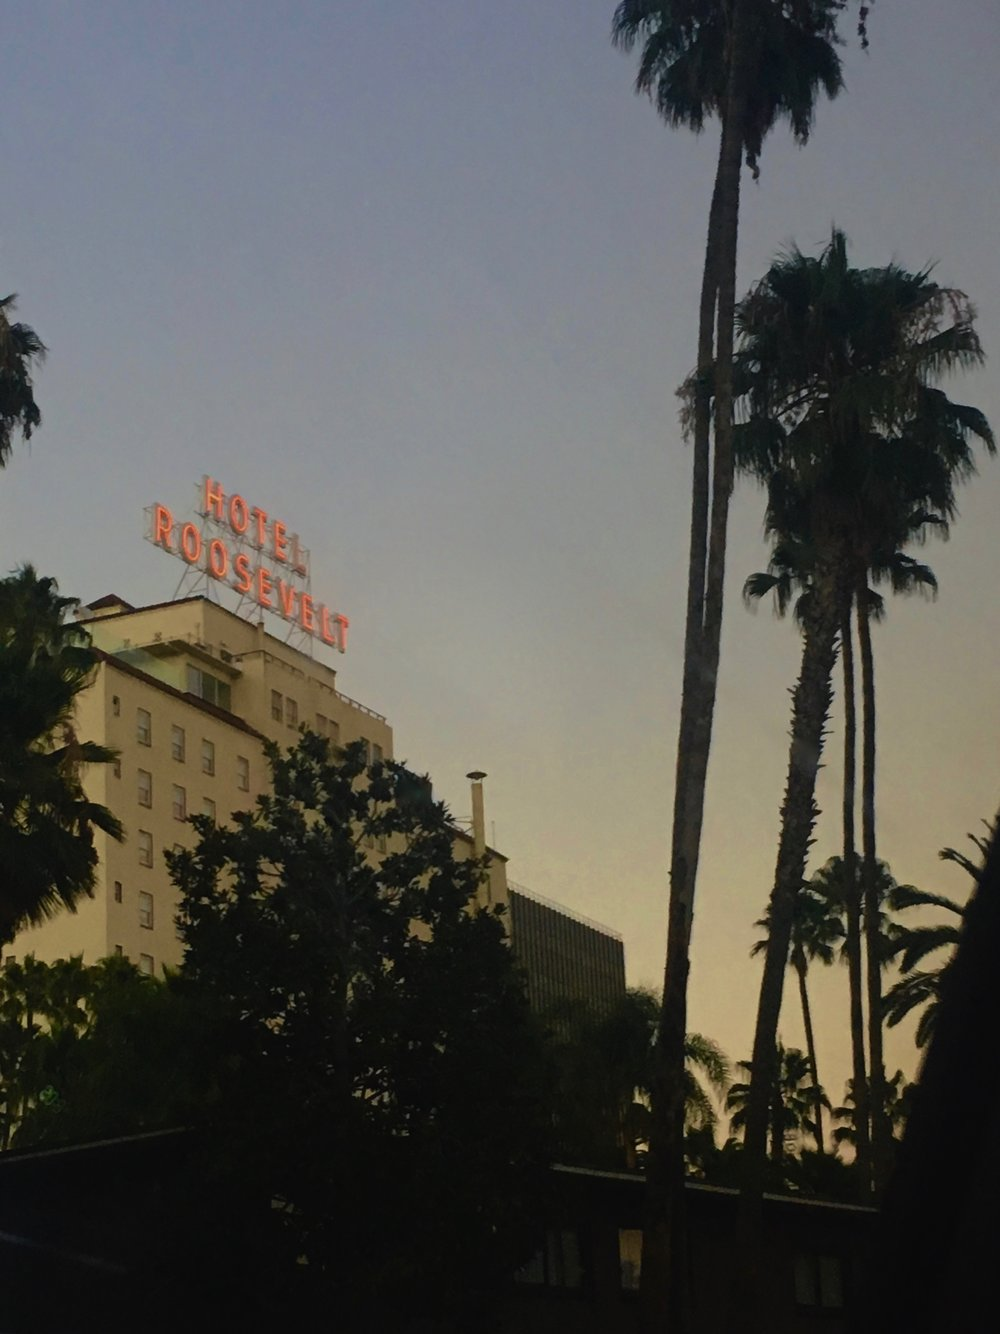 The Hollywood Roosevelt (photo by Meghan Ianiro)